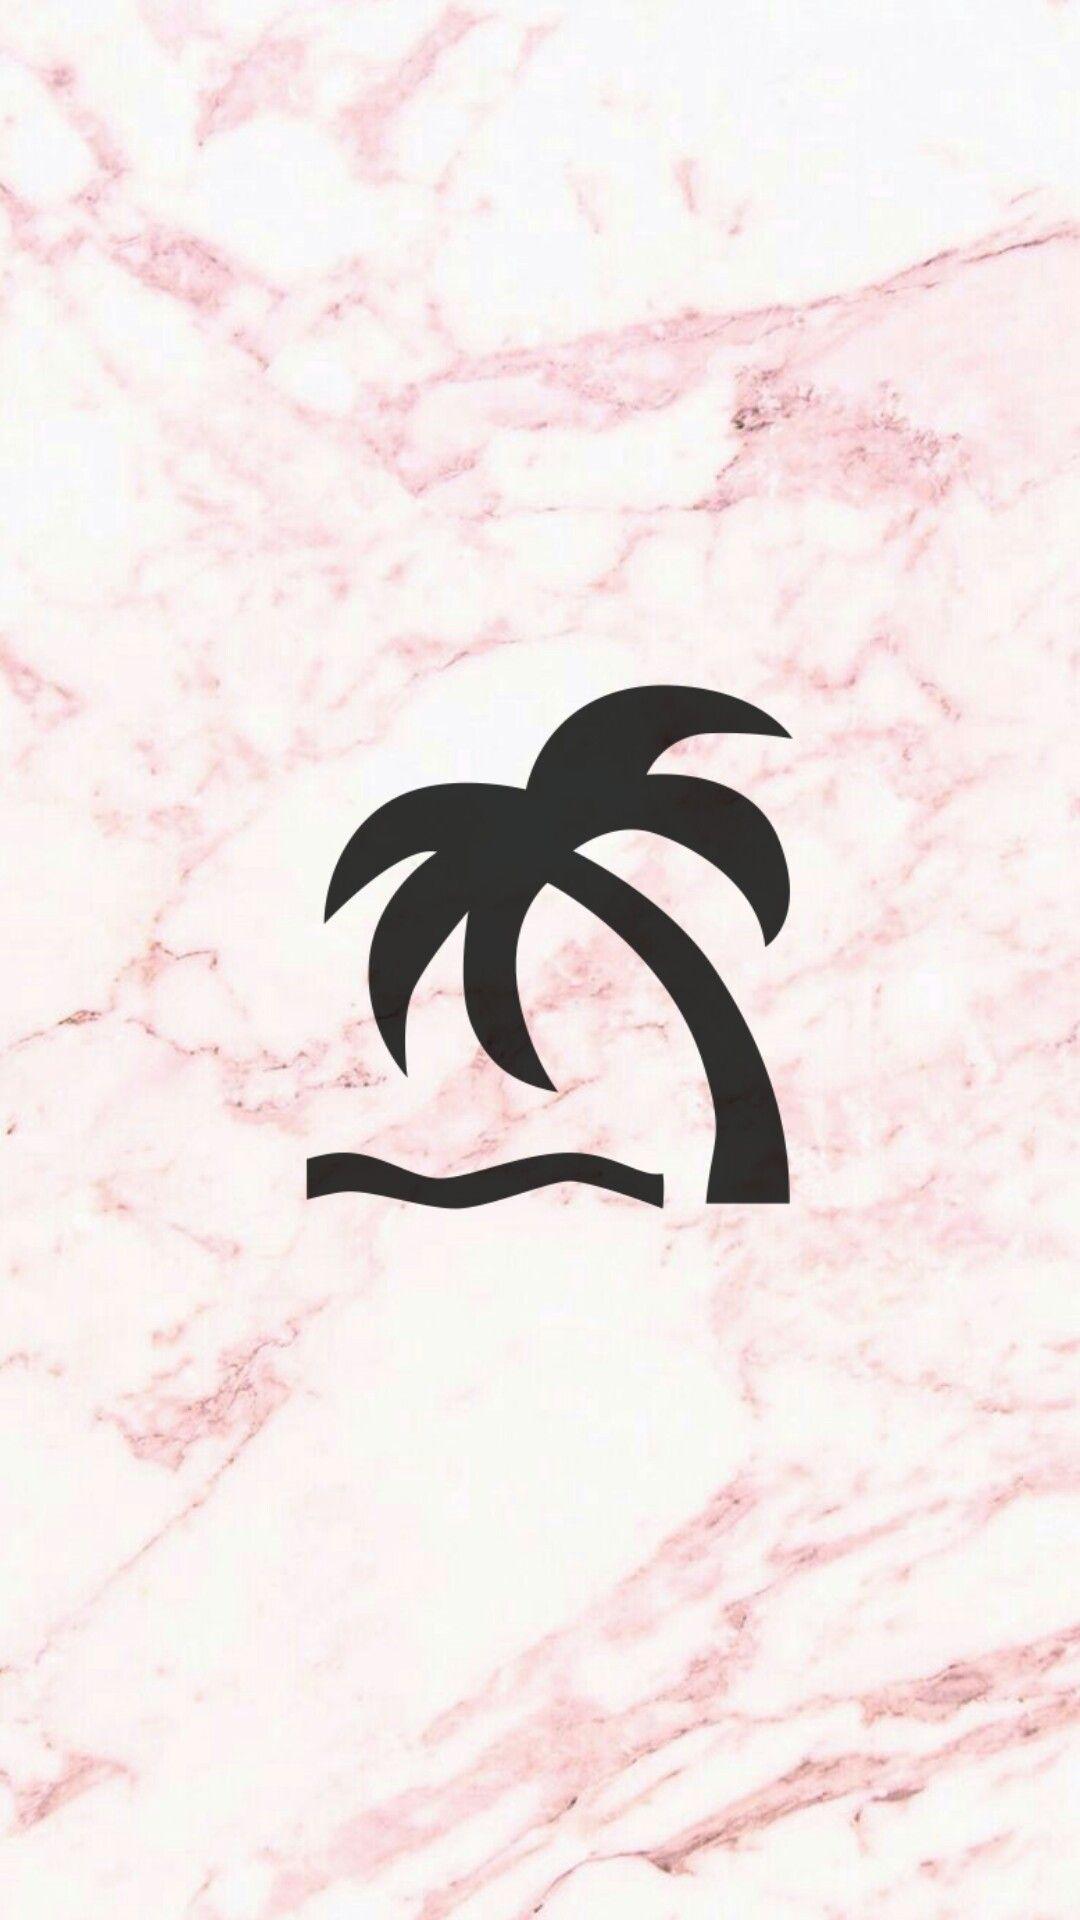 Sfondi per foto instagram